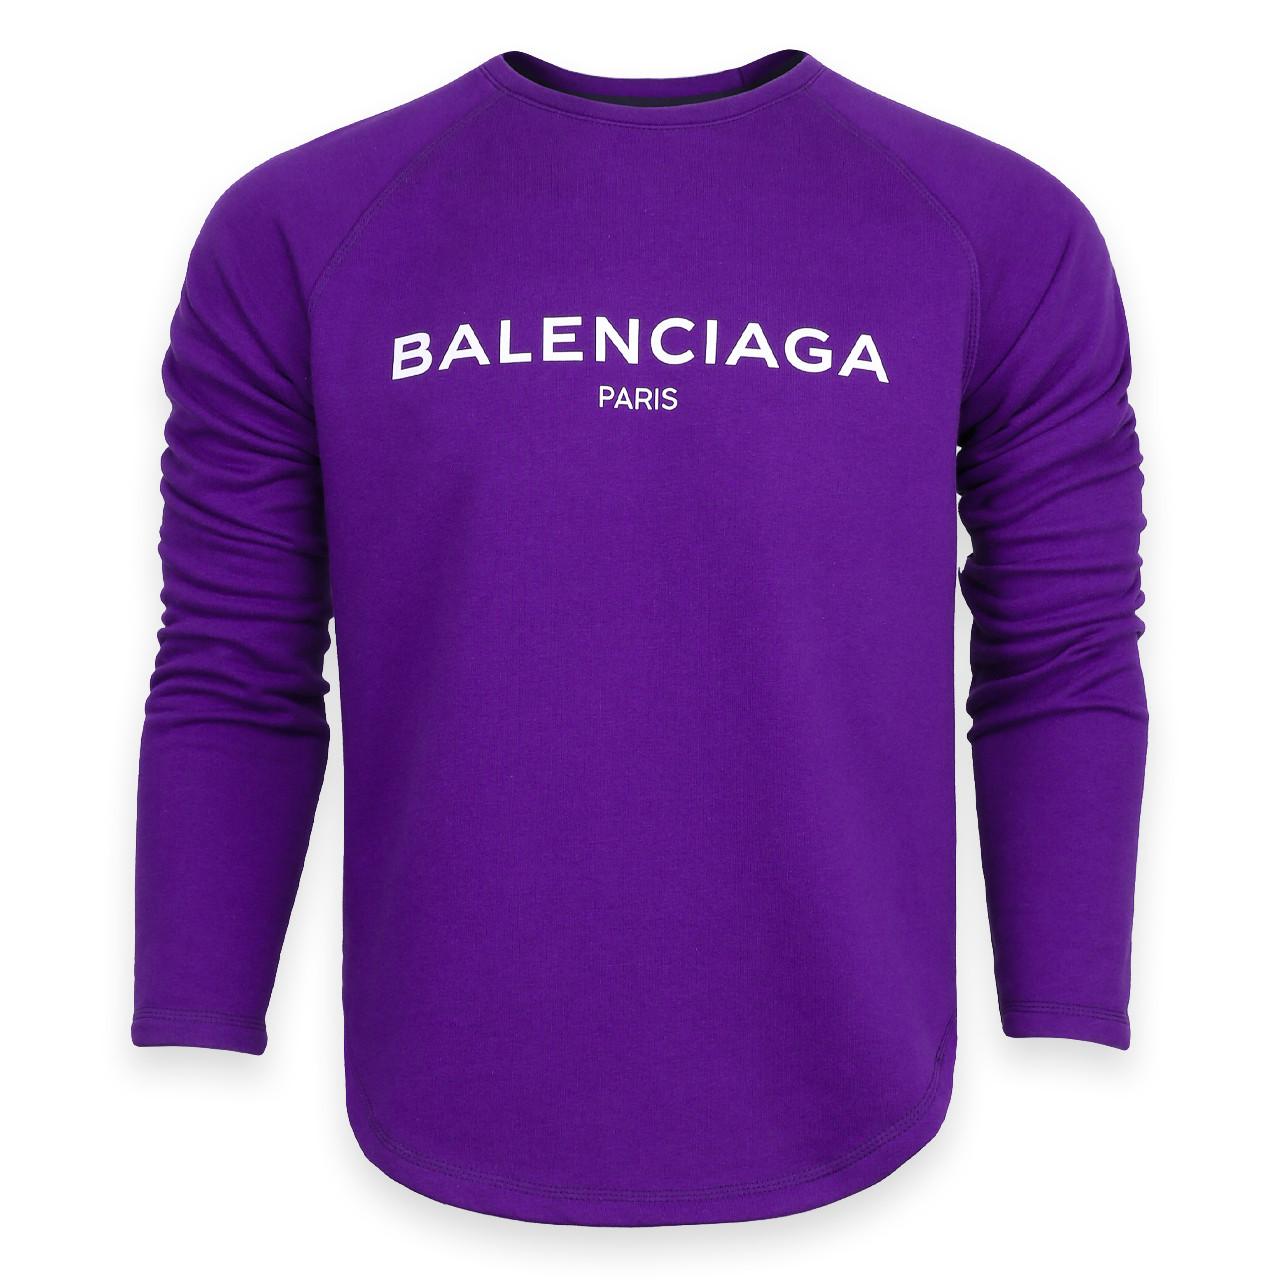 Свитшот фиолетовый BALENCIAGA с лого Р-2 PUR L(Р) 20-510-201